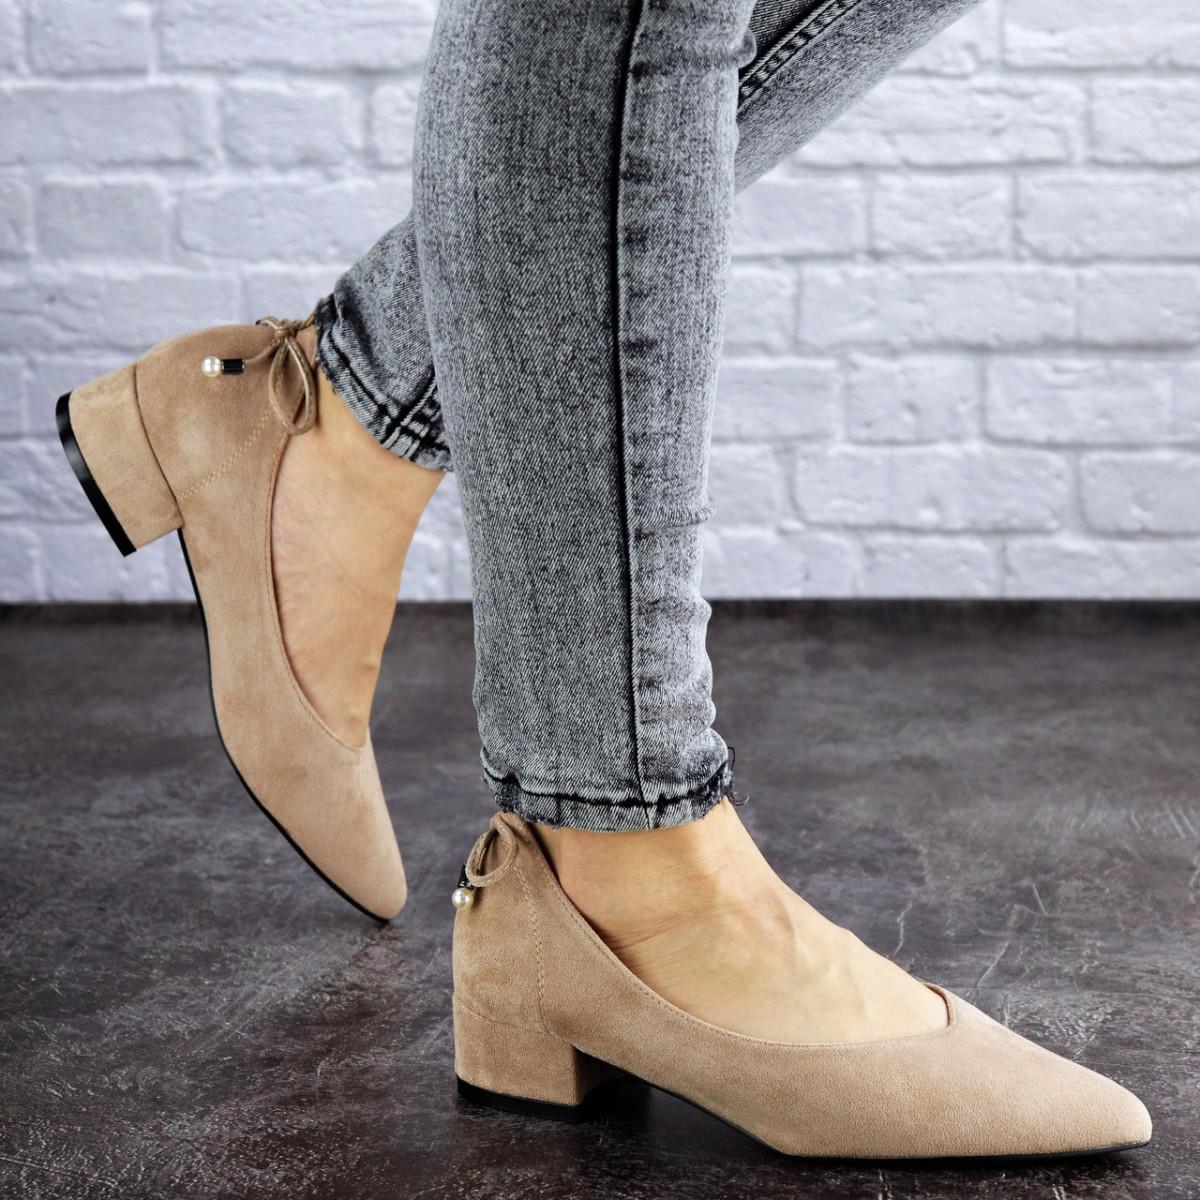 Женские туфли Fashion Tippy 2028 36 размер 23,5 см Бежевый